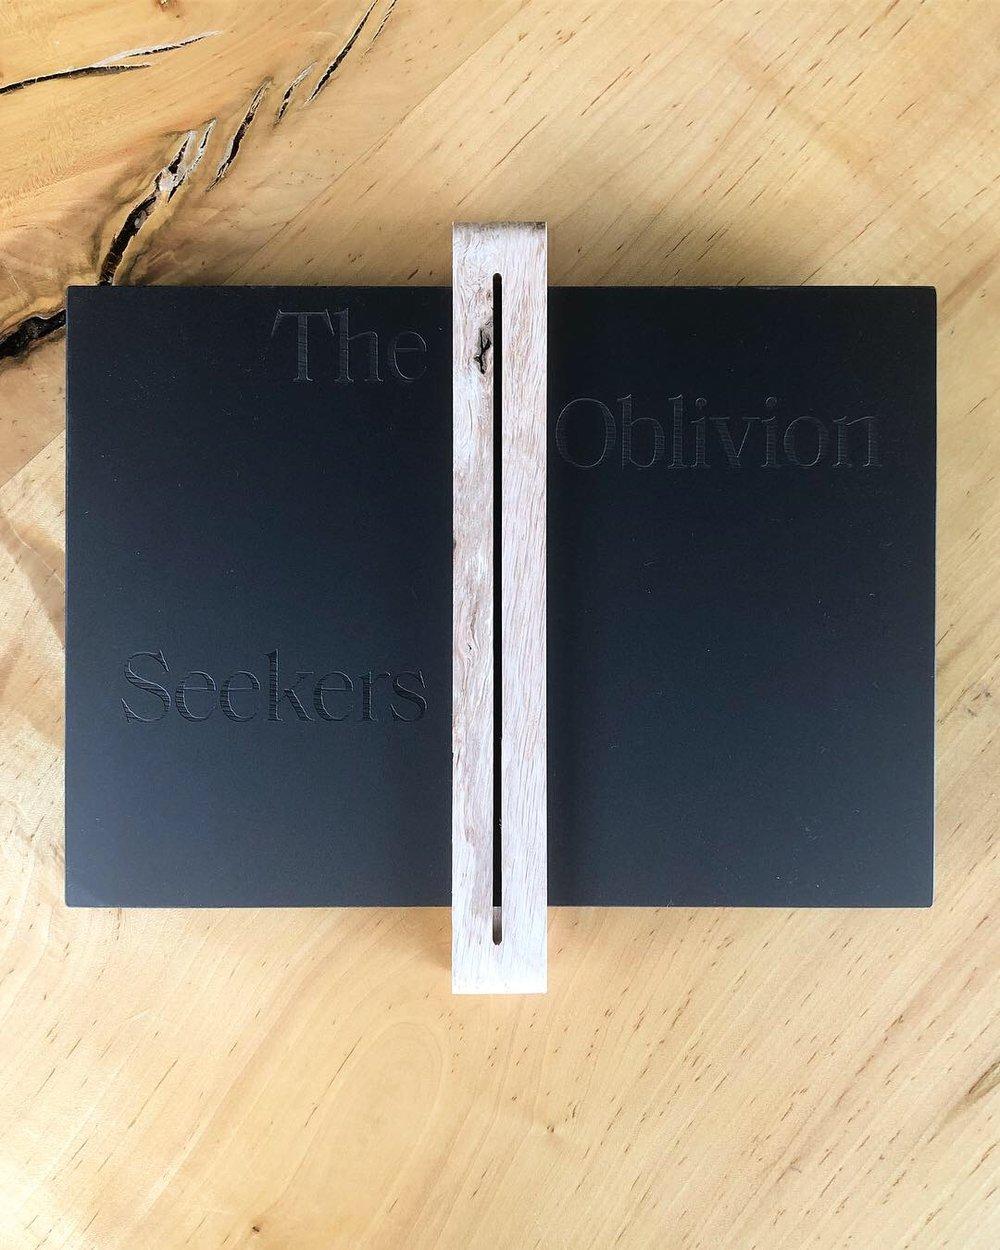 The Oblivion Seekers published by Ultraterrestrial.xyz —-2018—-